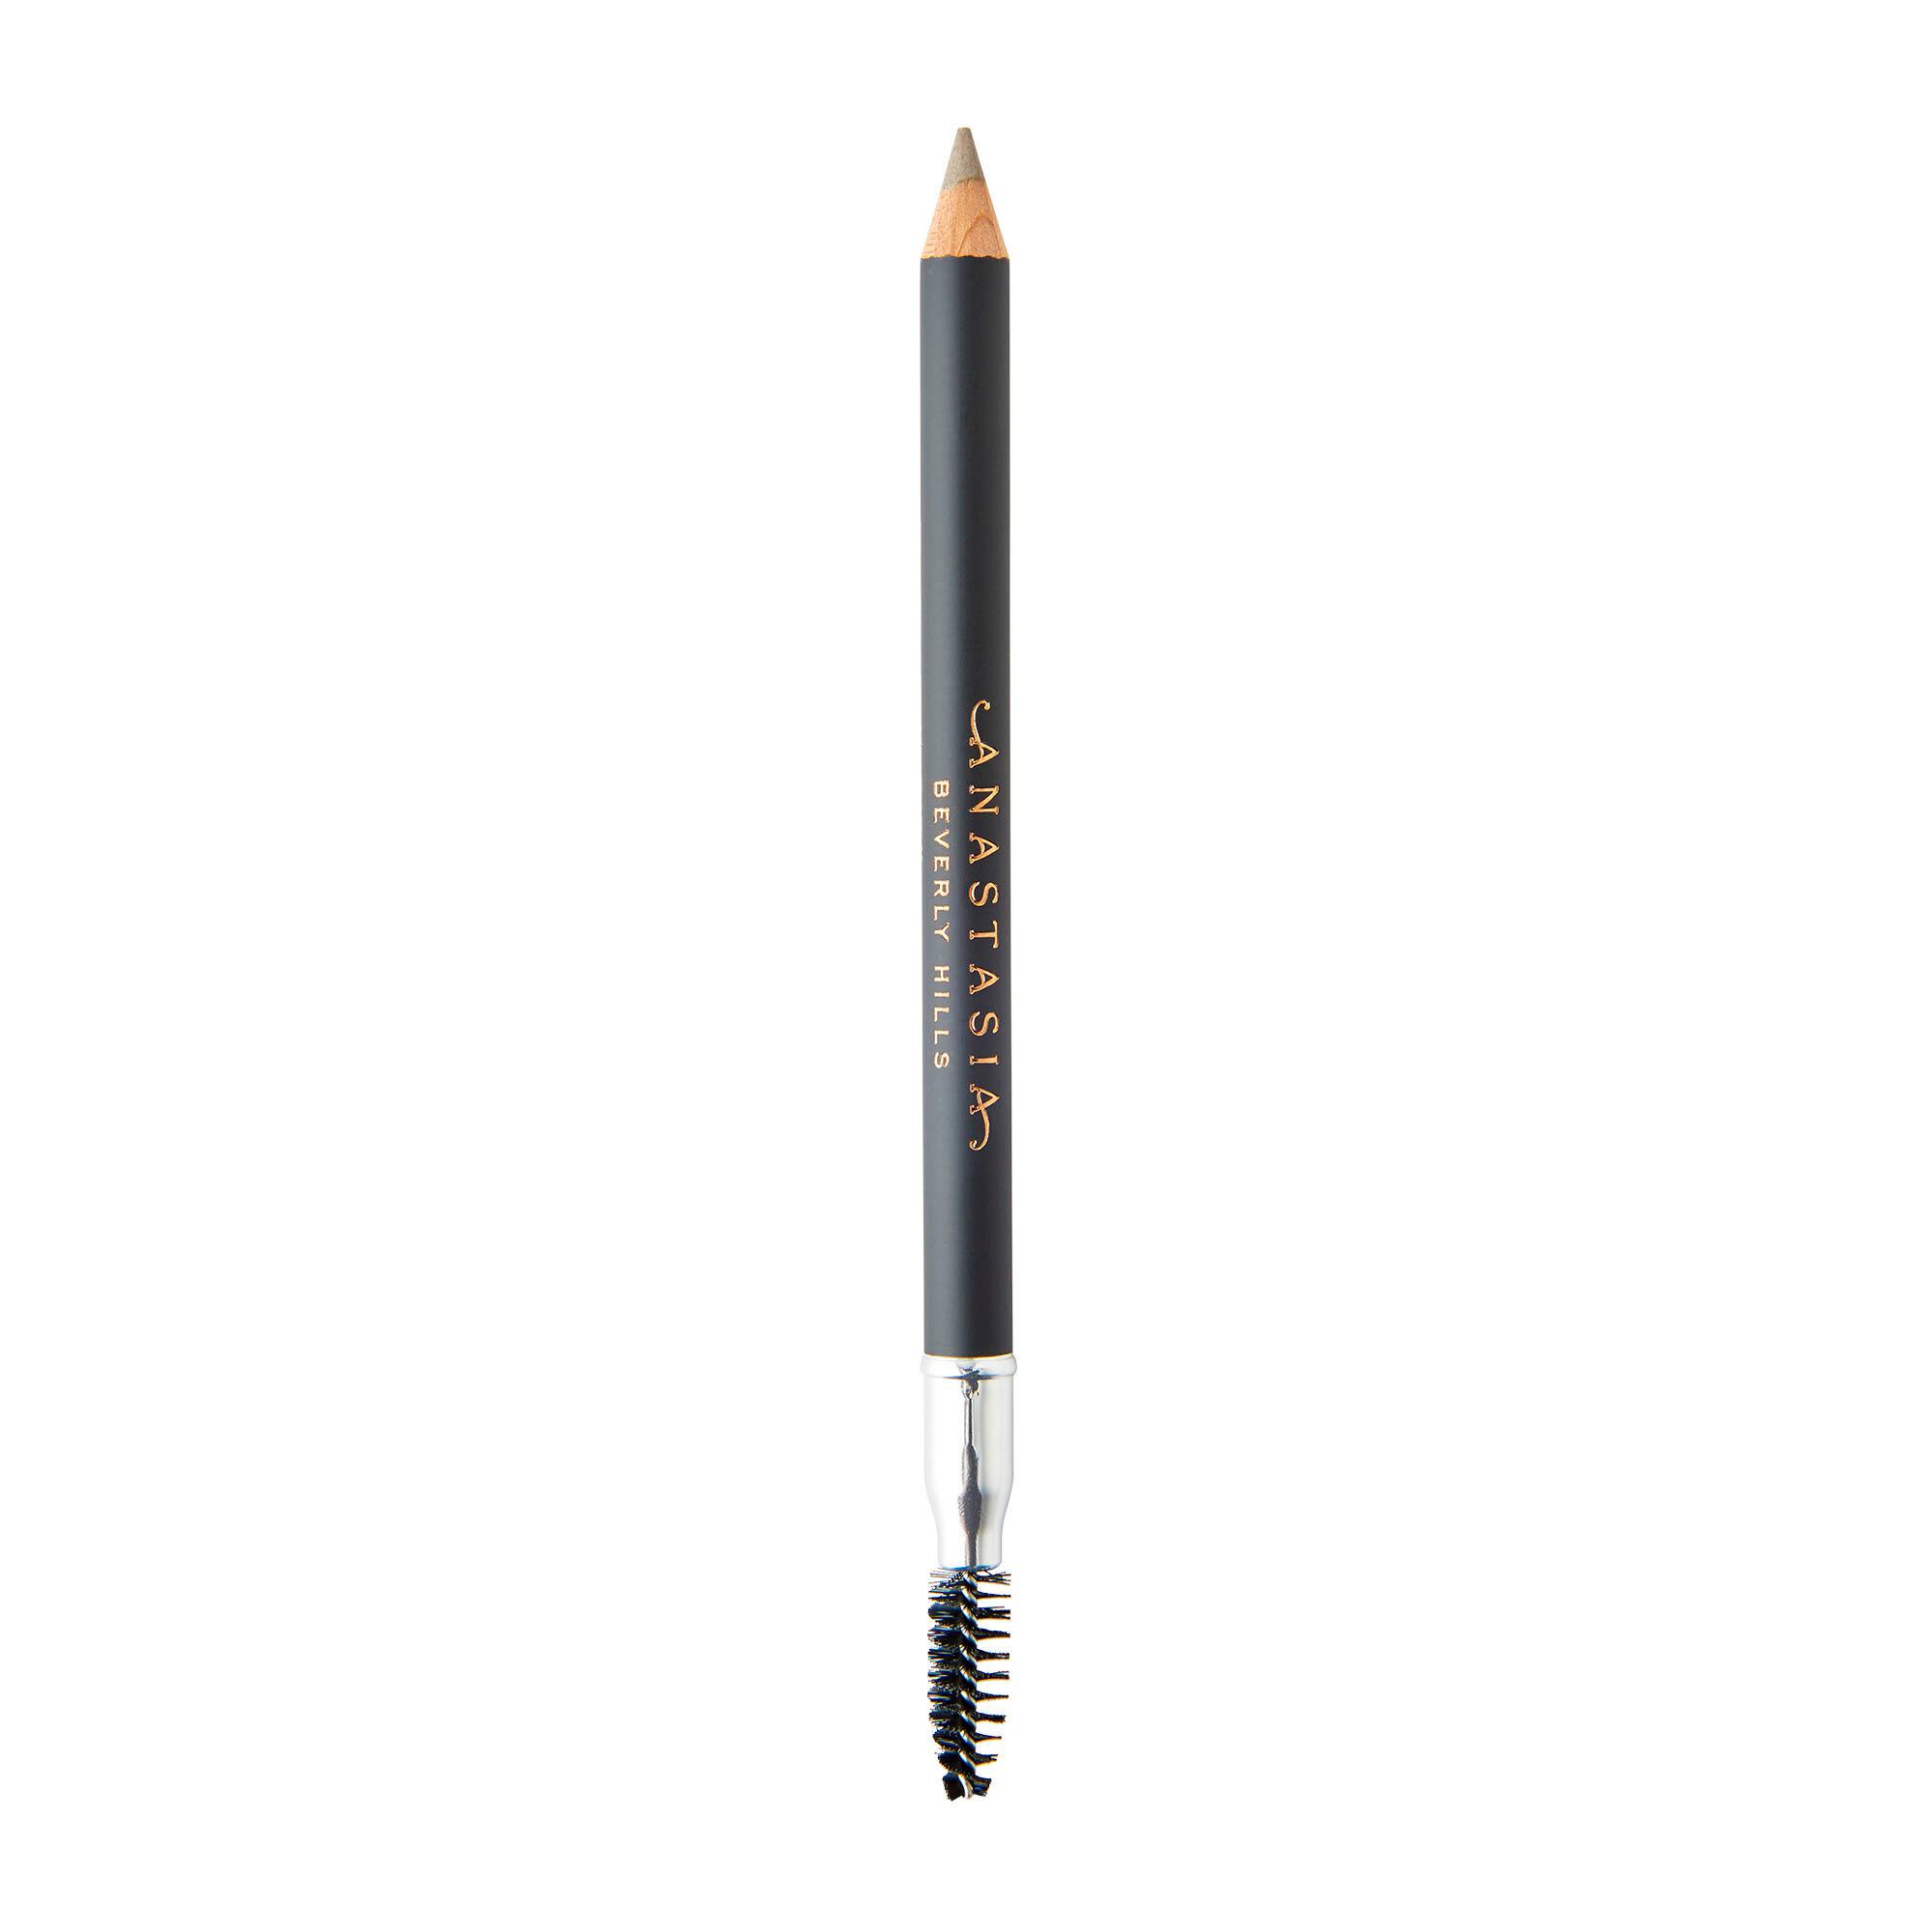 Anastasia Beverly Hills Crayon Perfect Brow Pencil Auburn Blonde 1.05g